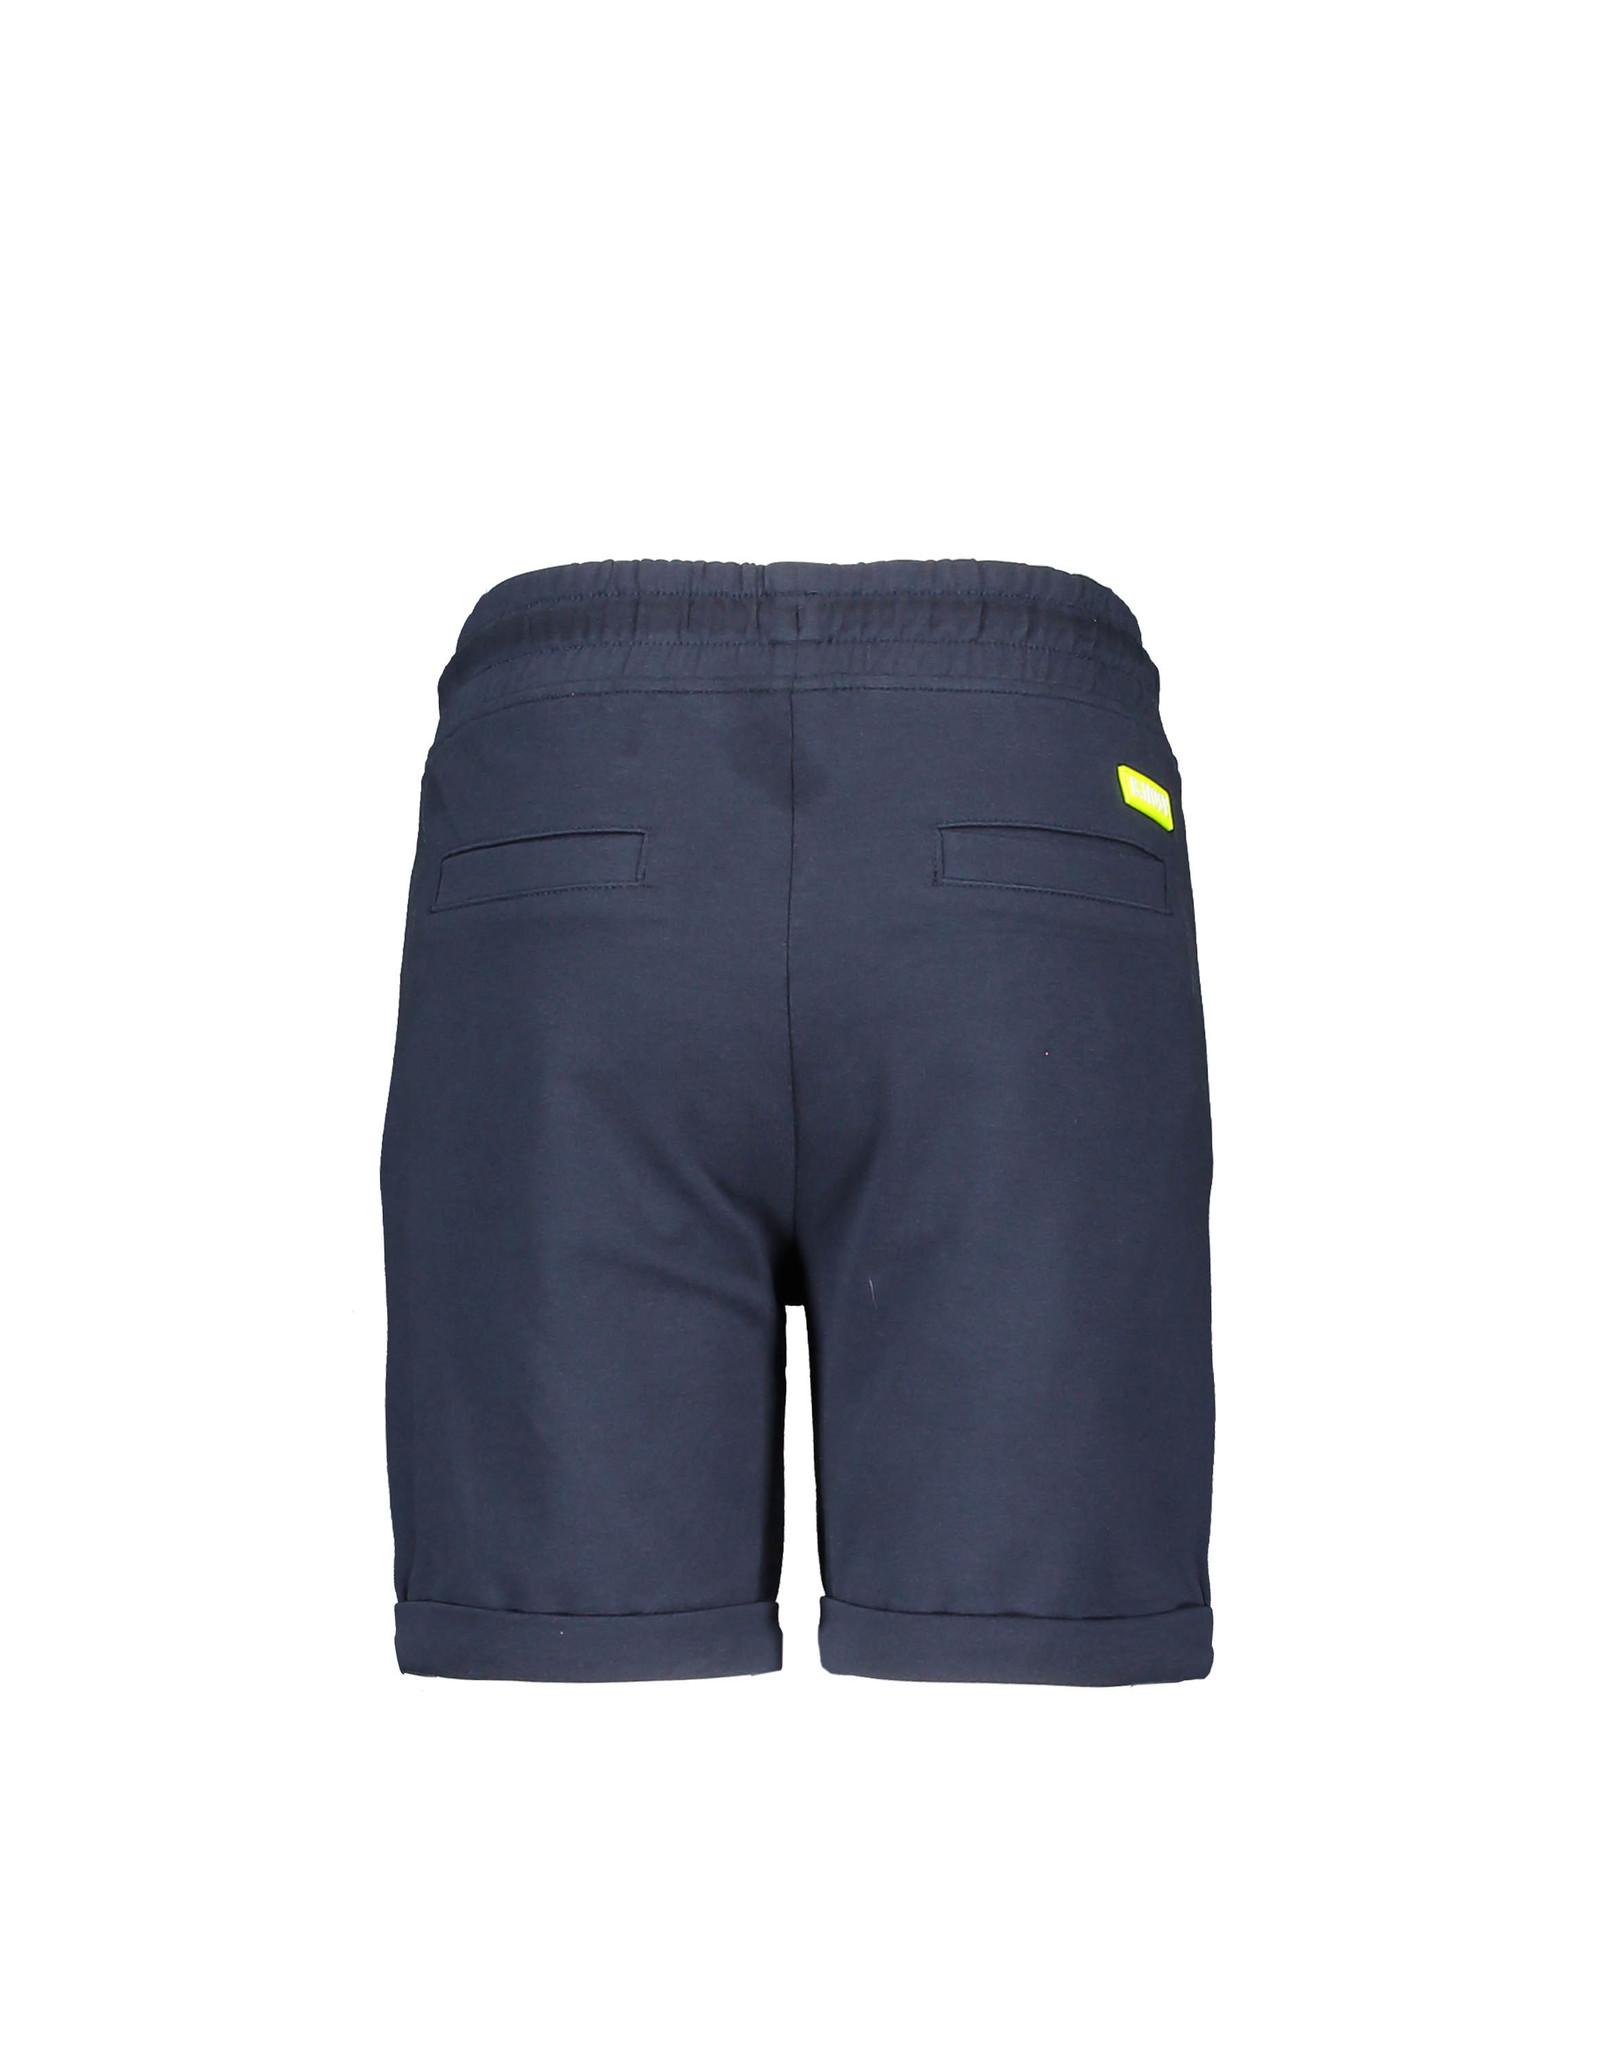 B-Nosy Boys uni shorts with smocked wb, Oxford blue